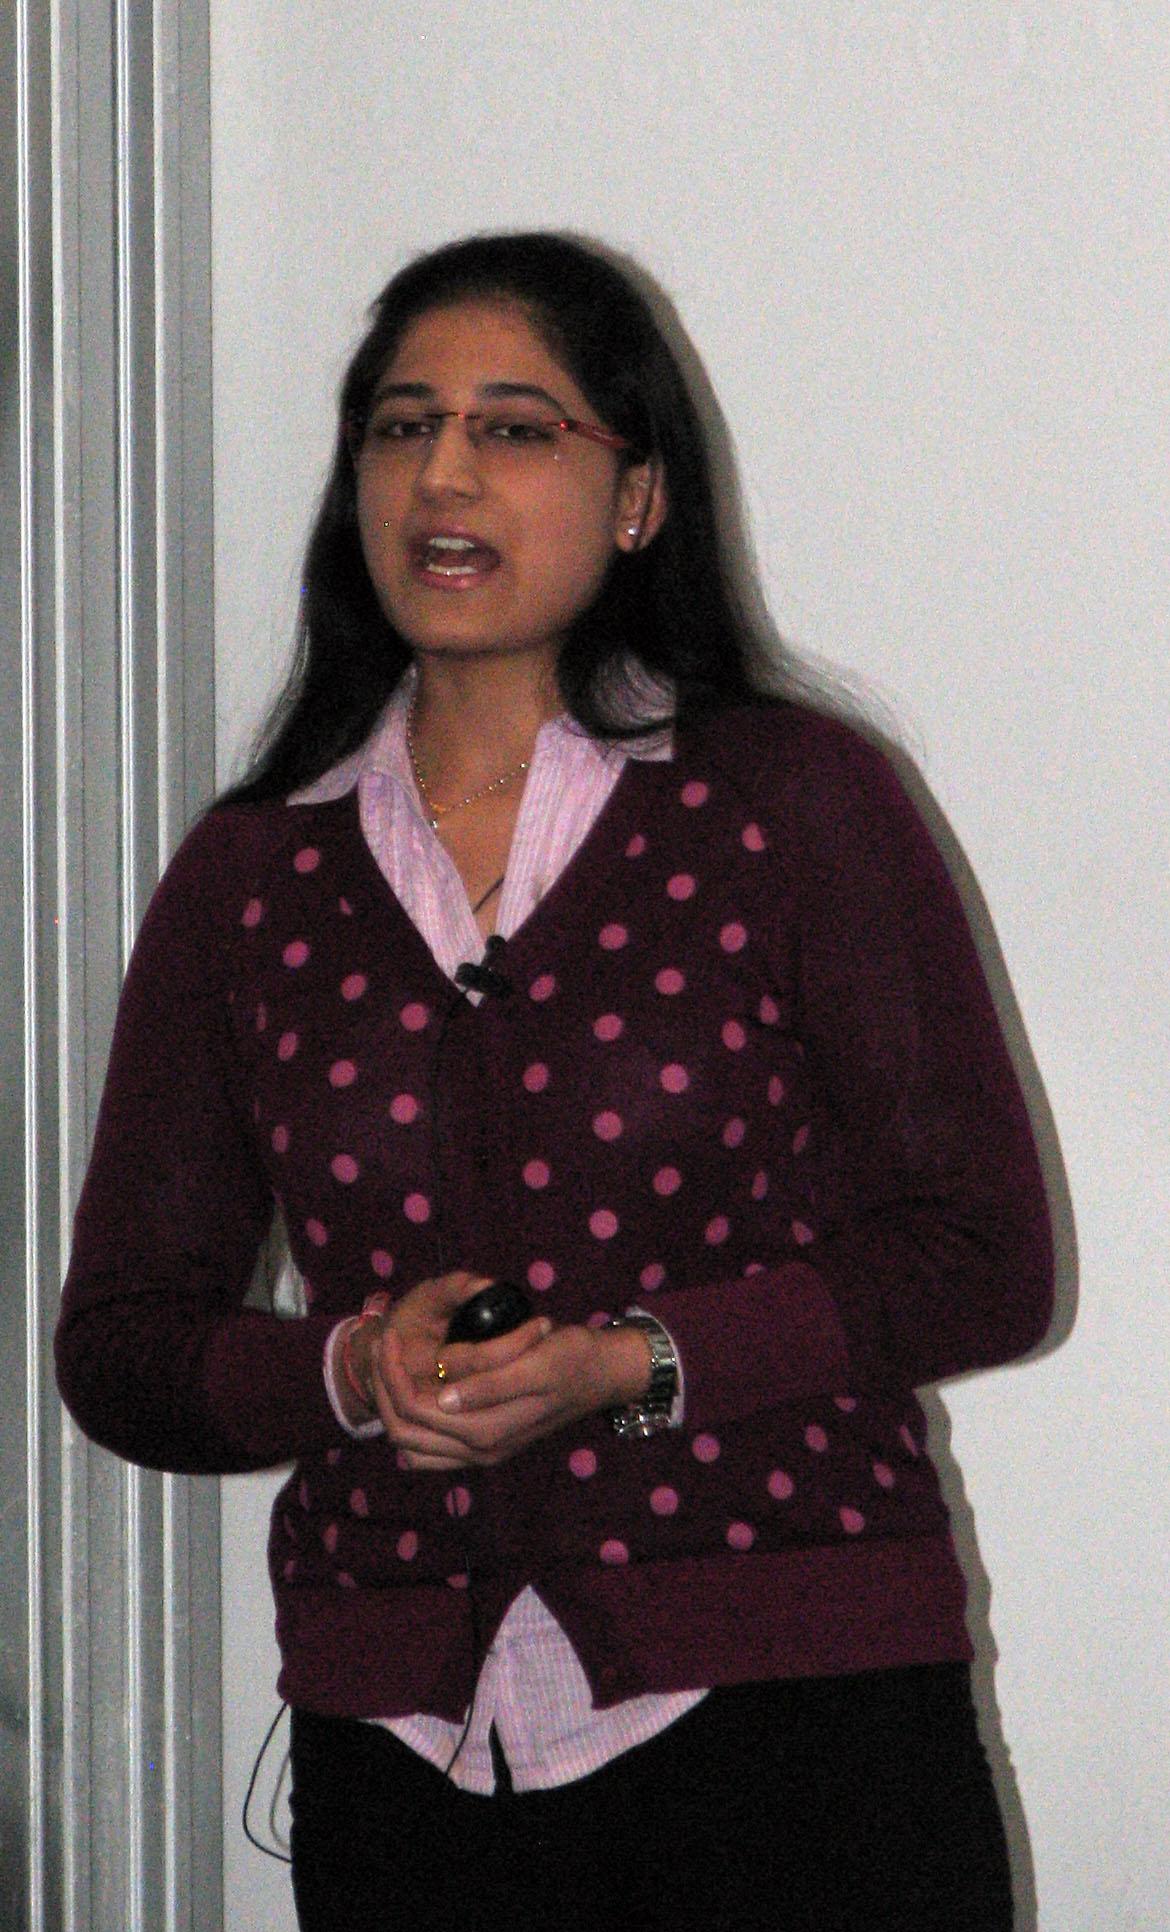 Priyadarshini Kachroo, Night of the Profs, 2013